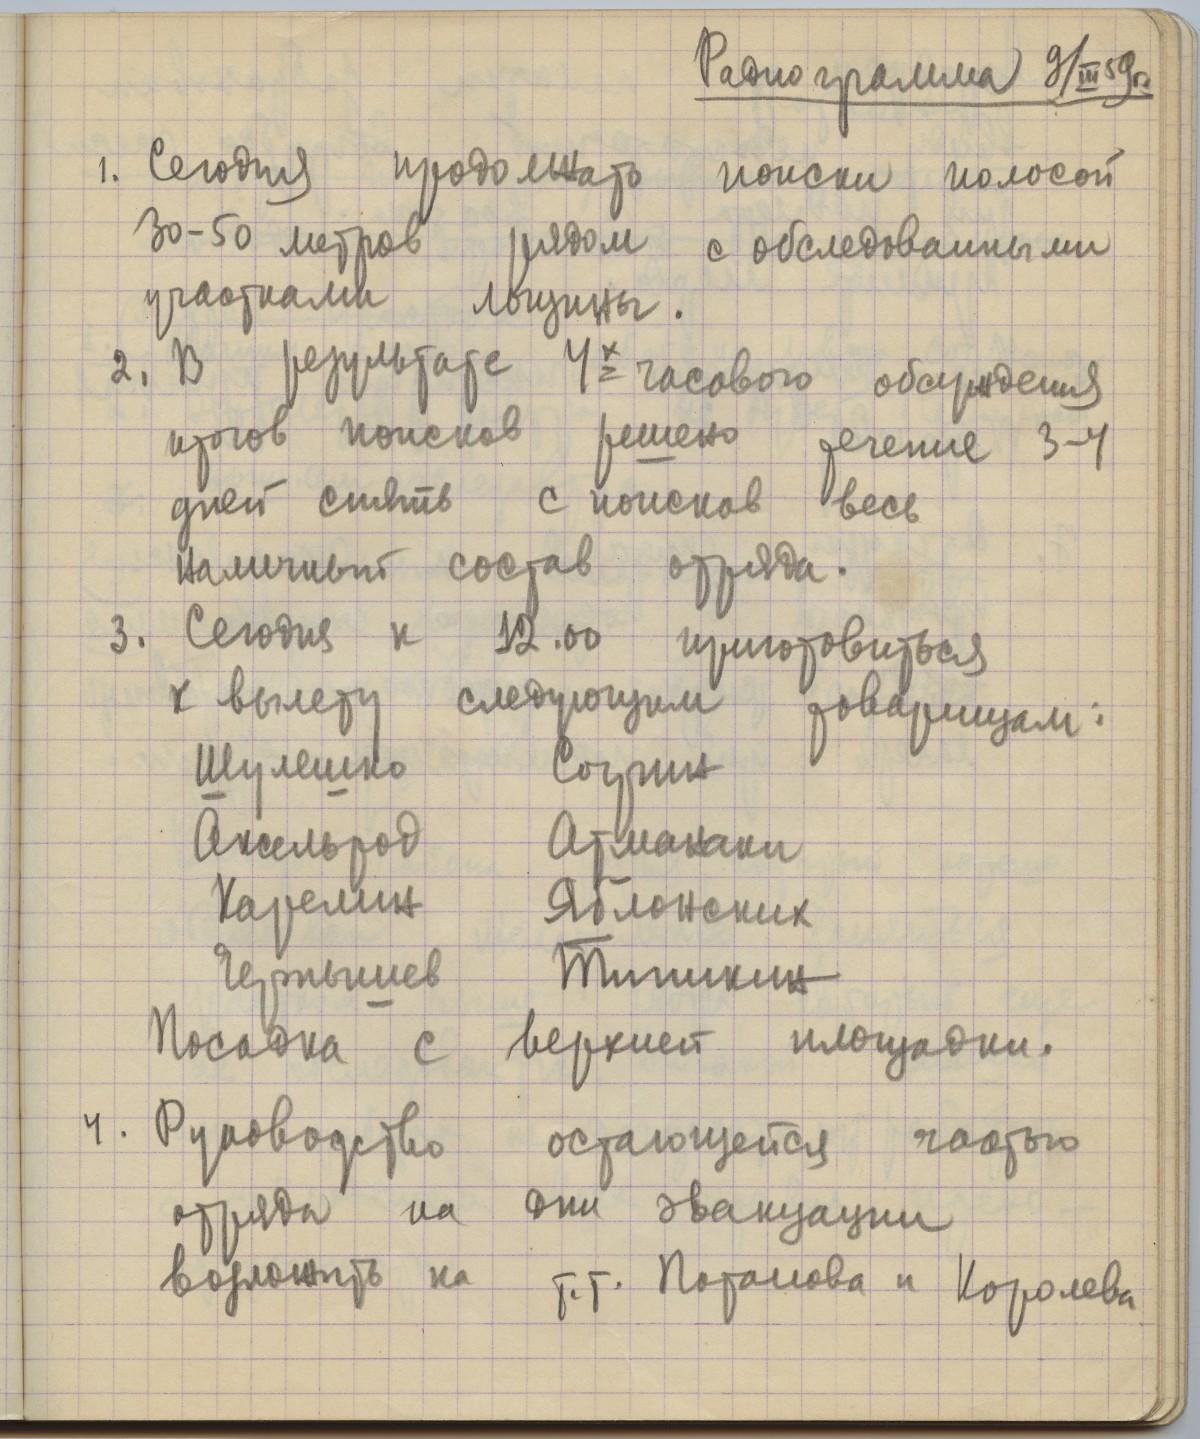 https://dyatlovpass.com/resources/340/gallery/Dyatlov-pass-Maslennikov-notebook-2-61.jpg